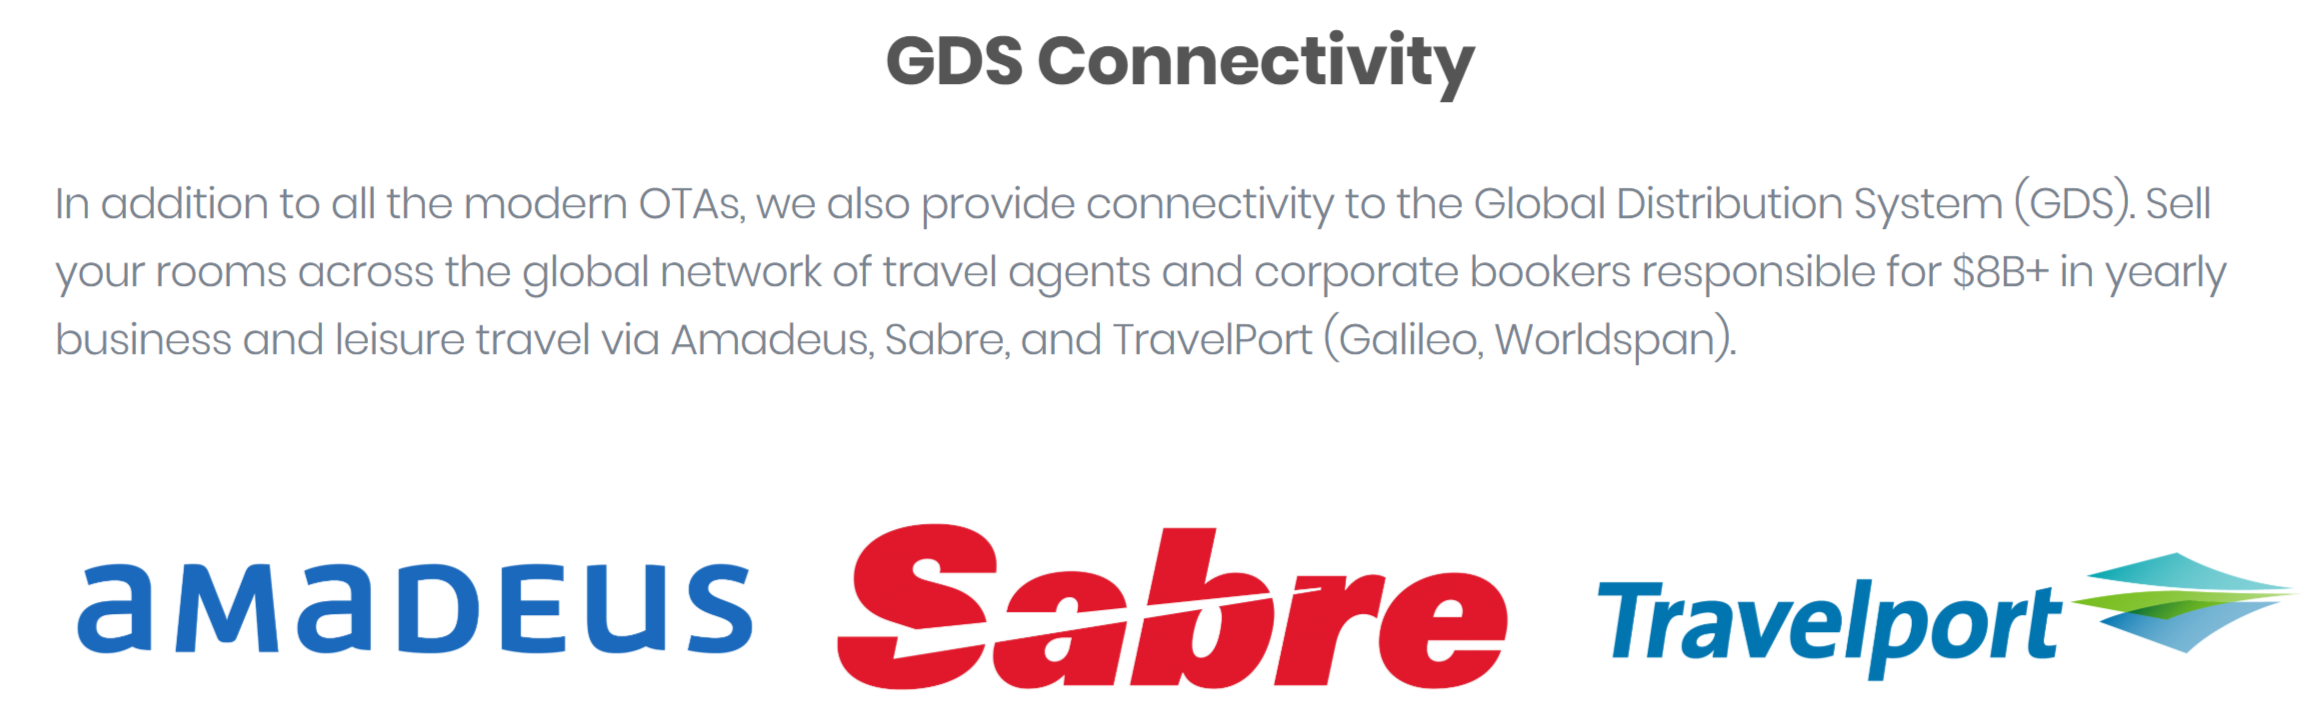 Hotel Global Distribution System | Hotel GDS Connectivity via Amadeus, Sabre, and TravelPort (Galileo, Worldspan).